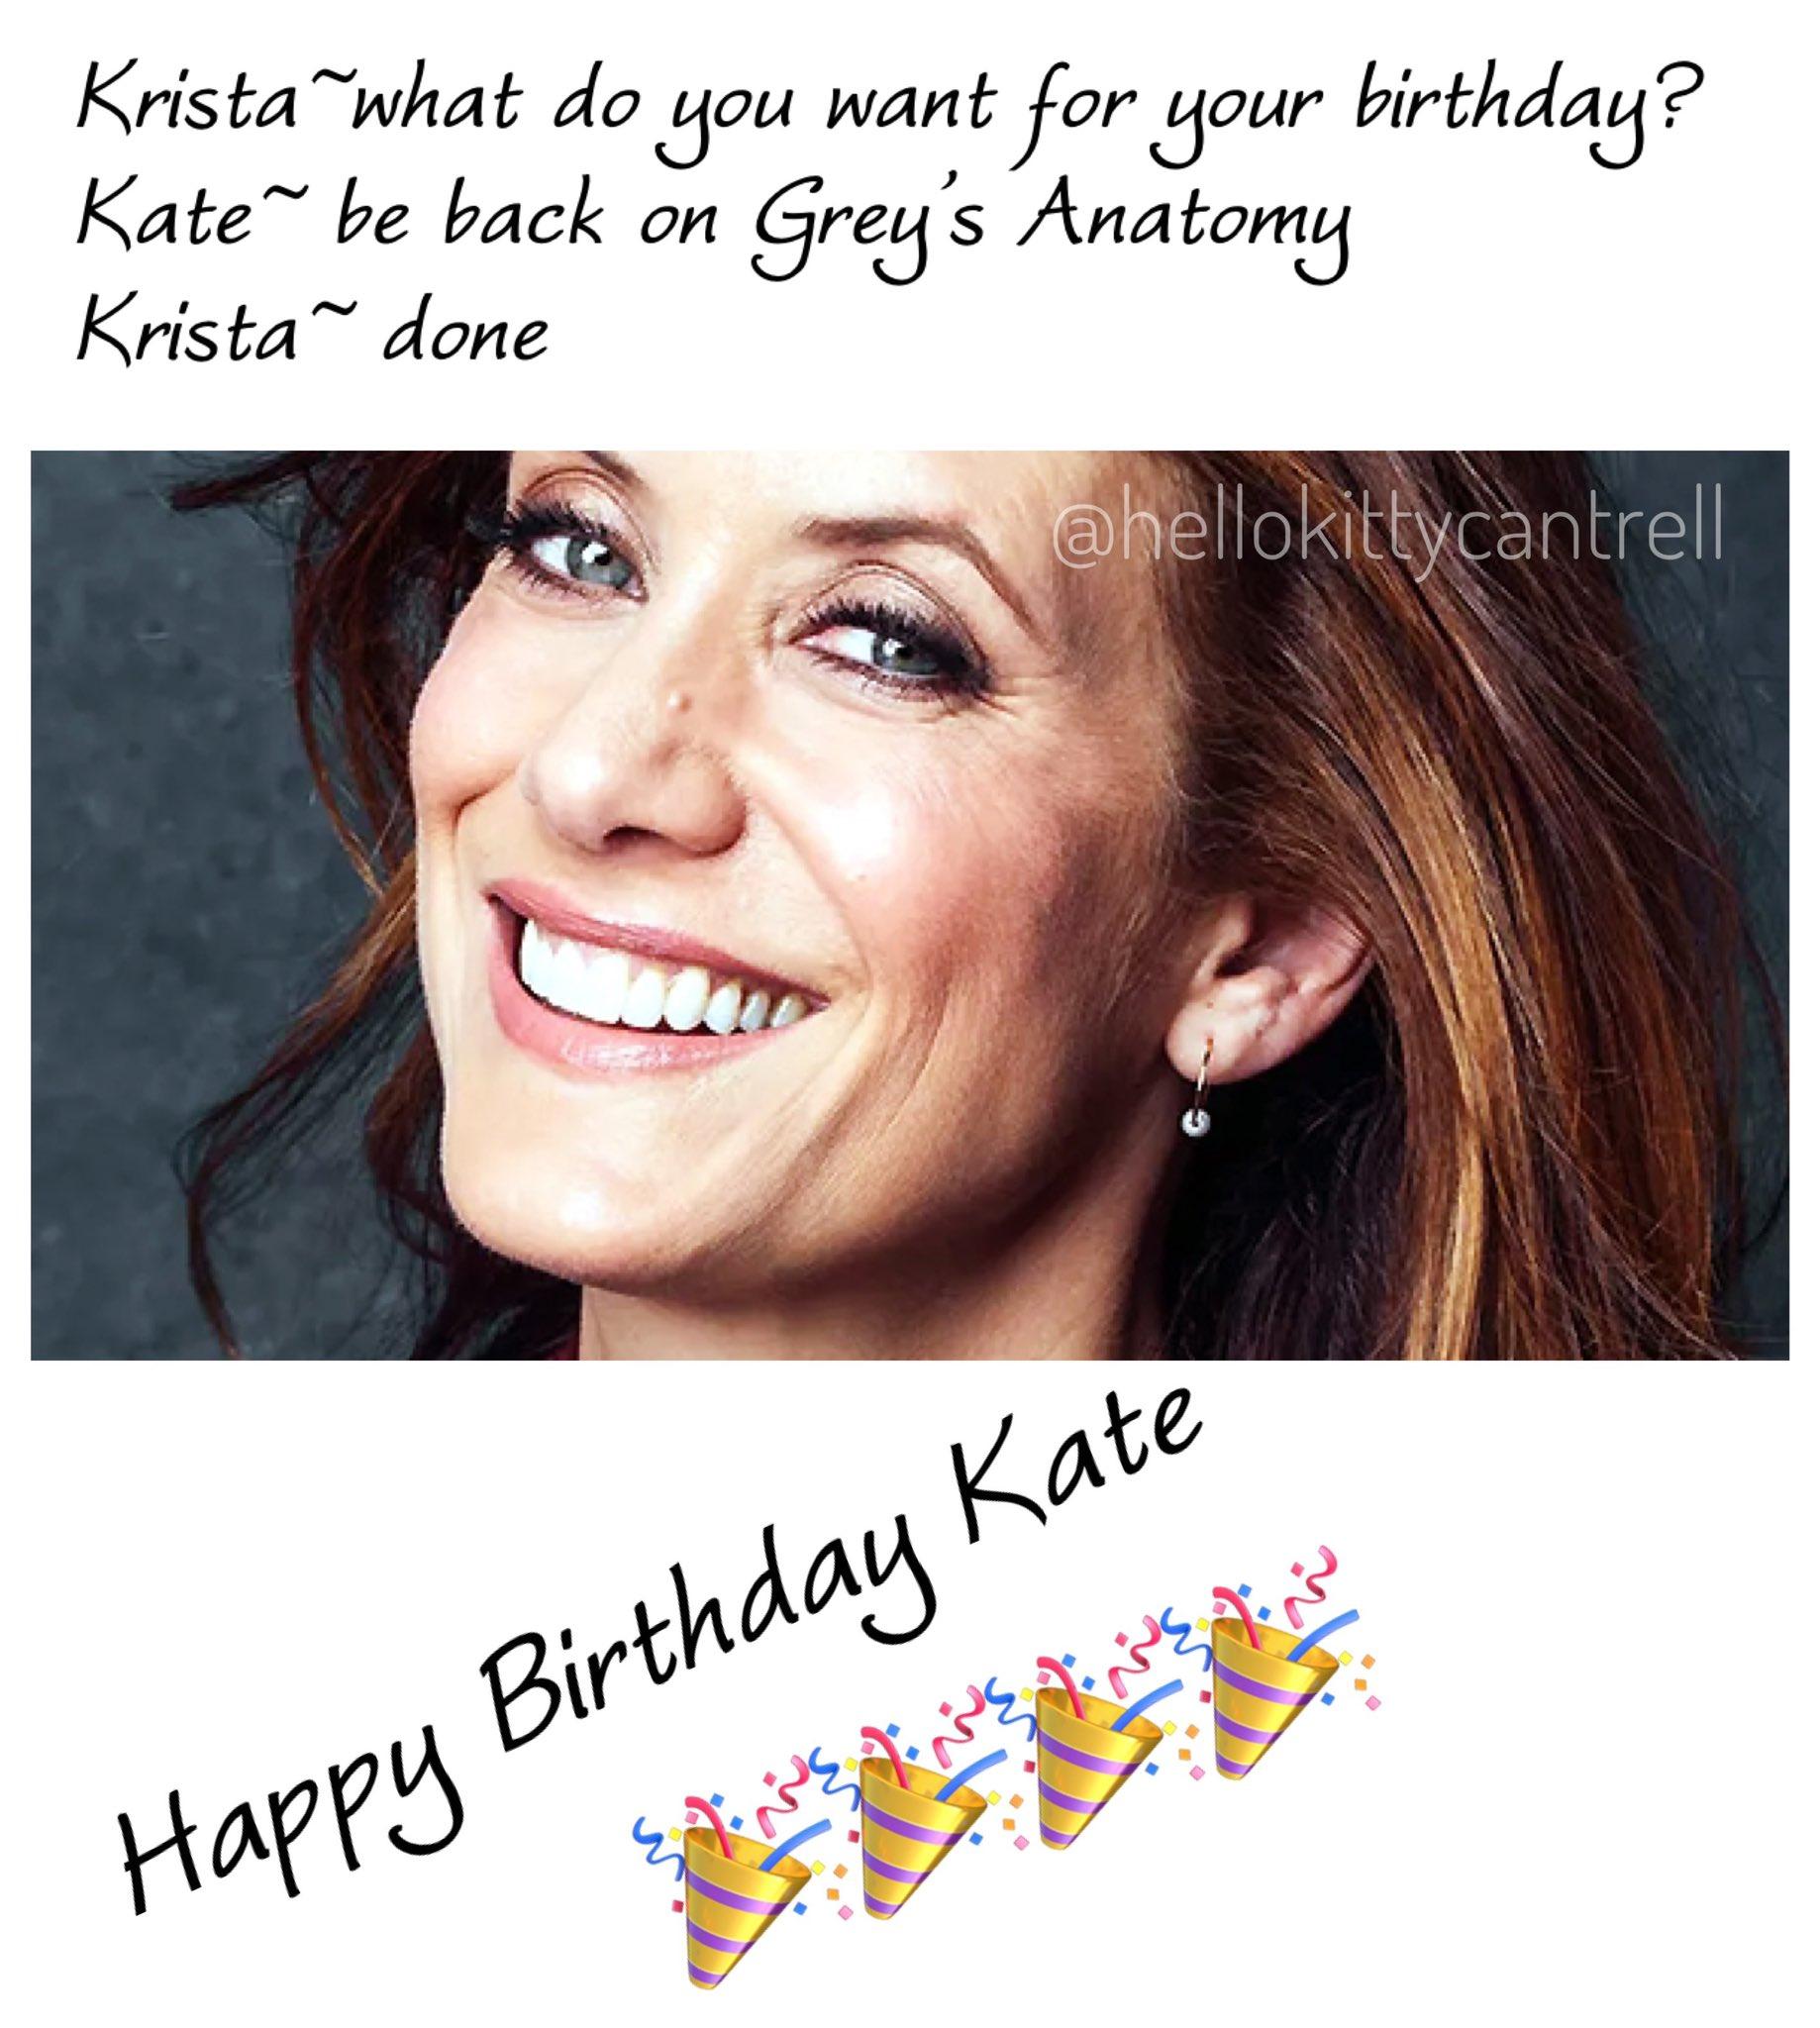 Happy Birthday Kate Walsh